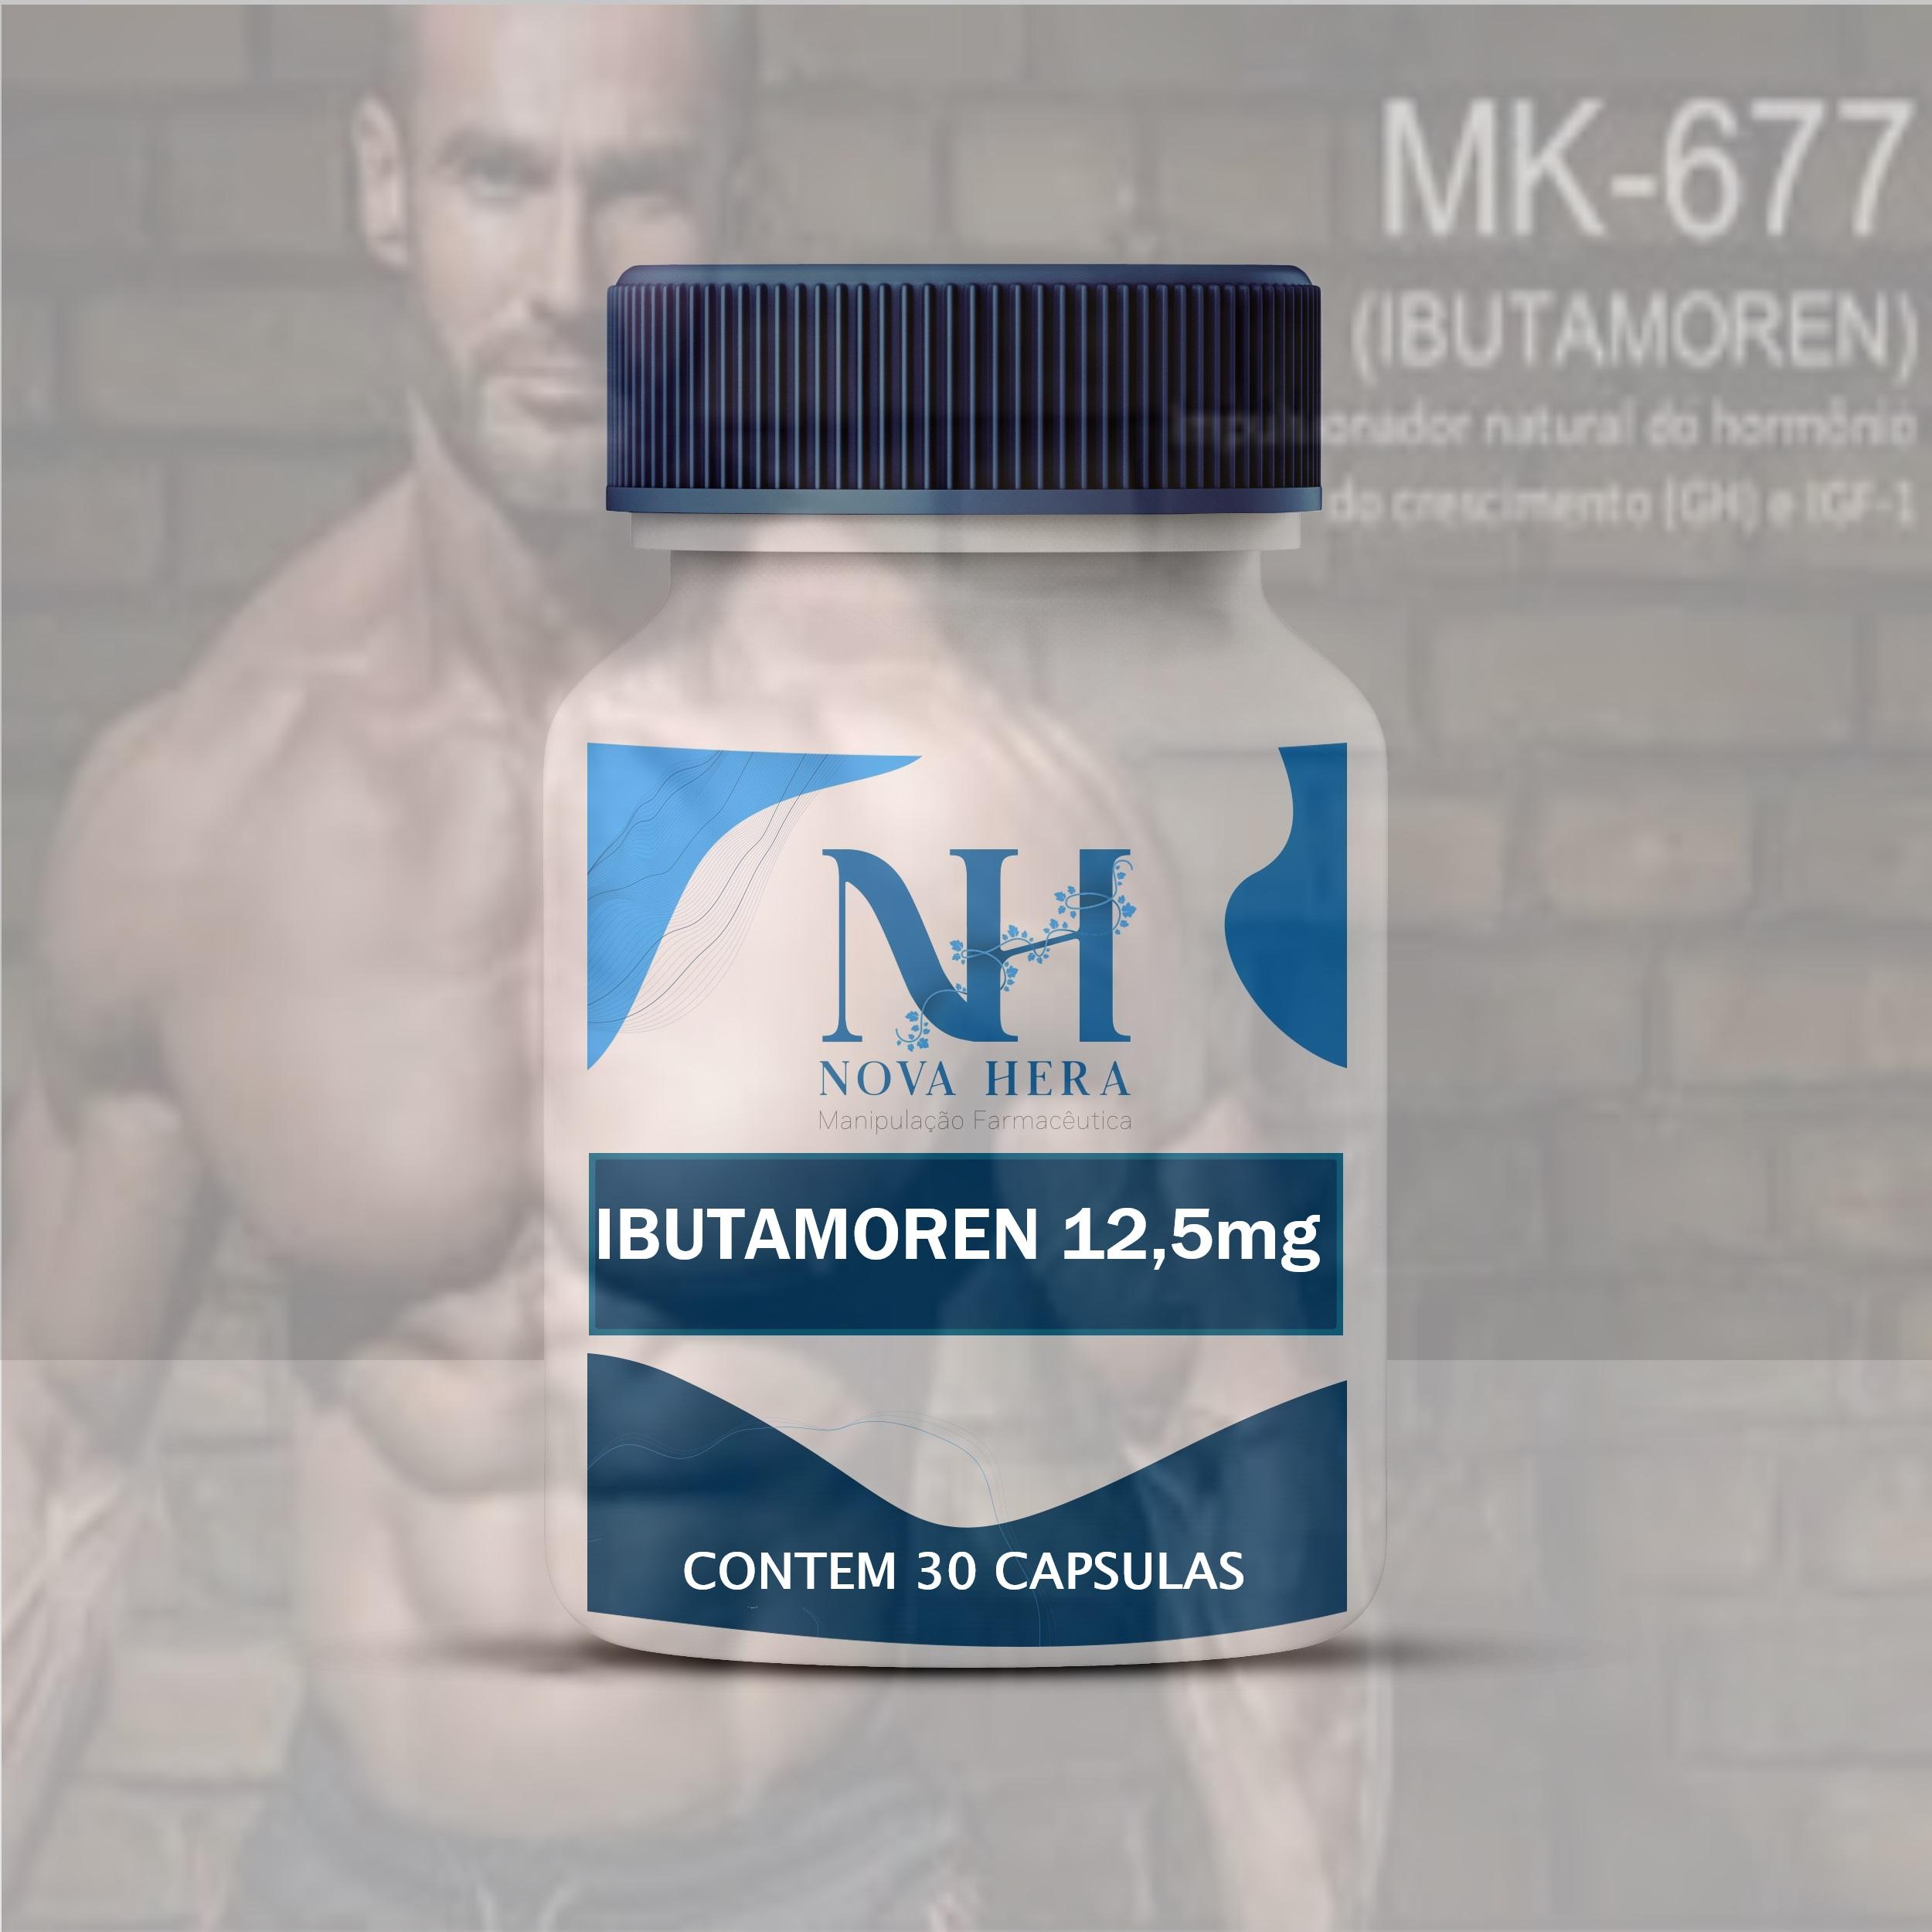 https://www.farmacianovahera.com.br/view/_upload/produto/95/1594237126ibutamoren-12_5.jpg